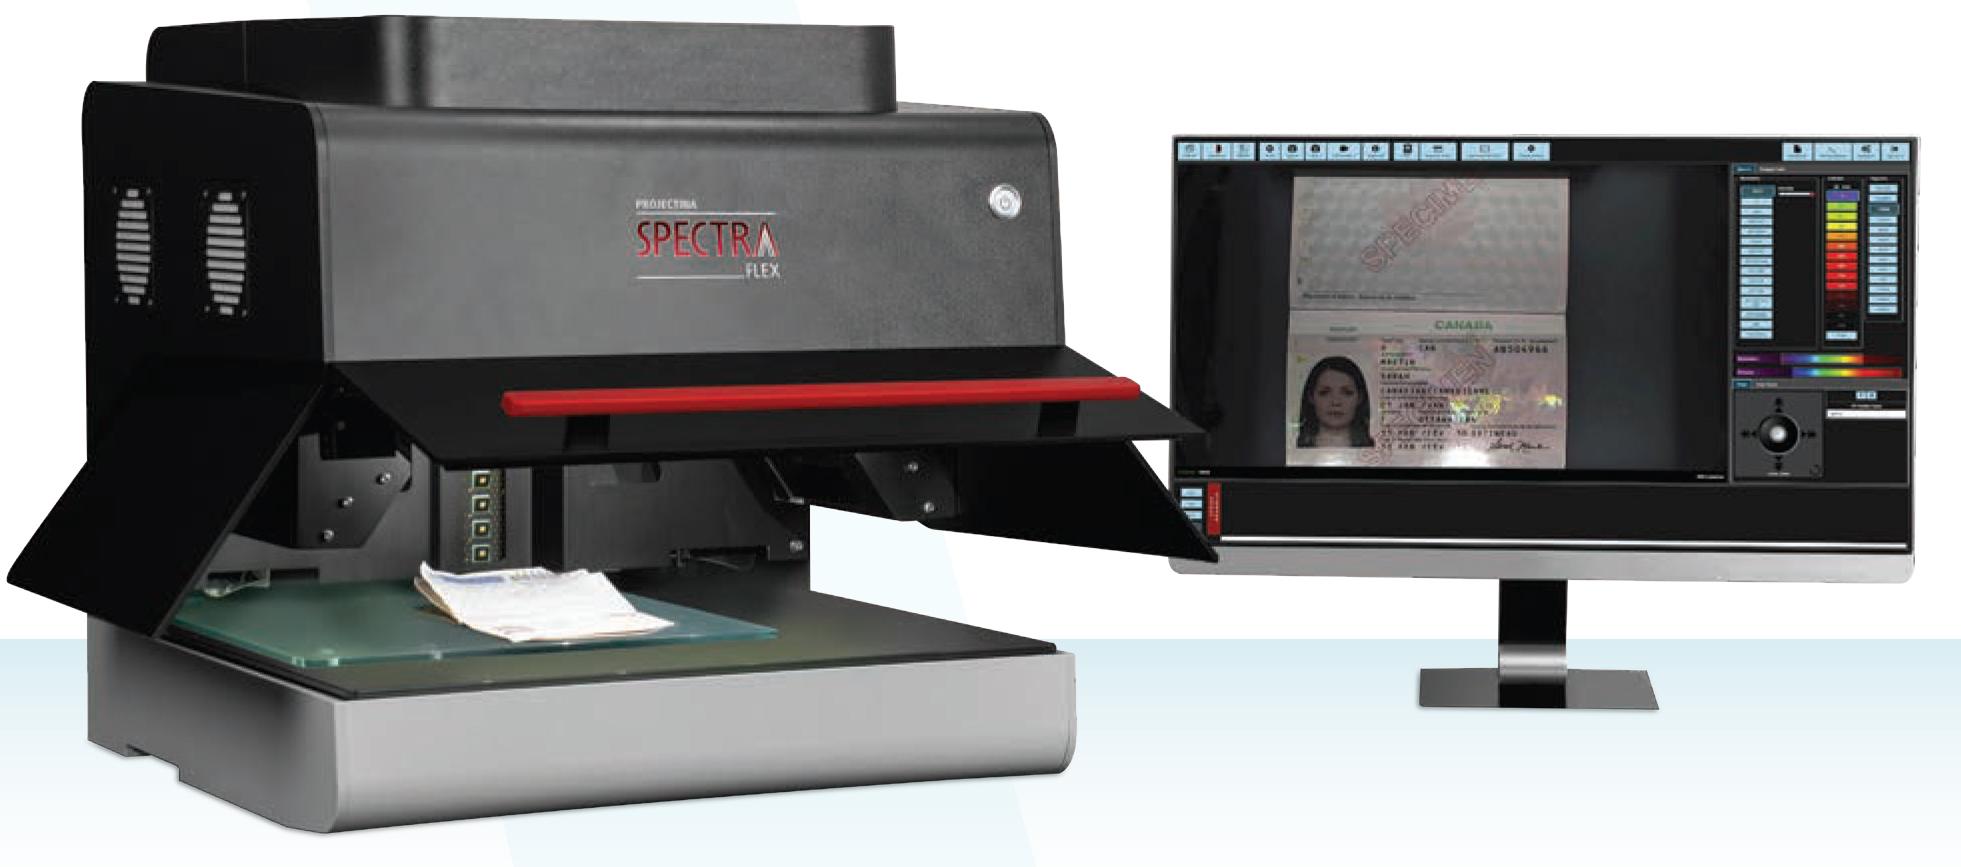 Spectra Flex z monitorem